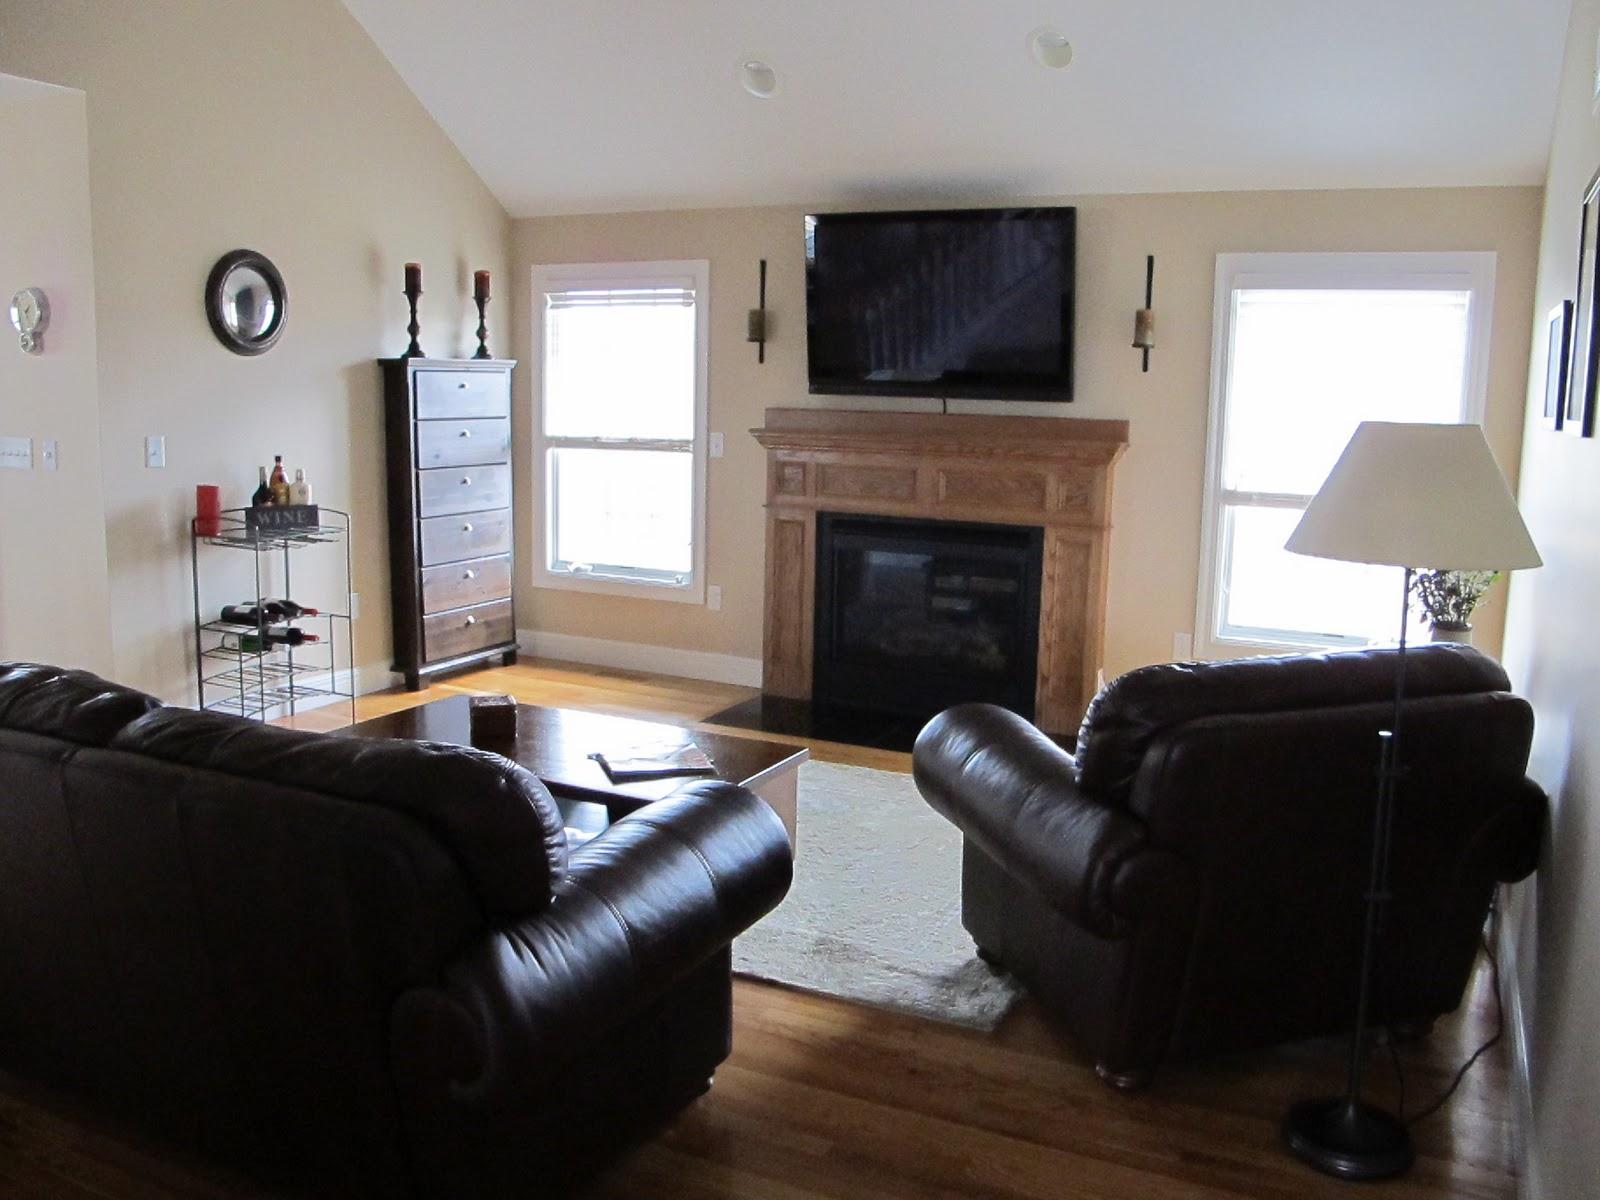 Living Room/Dining Room: